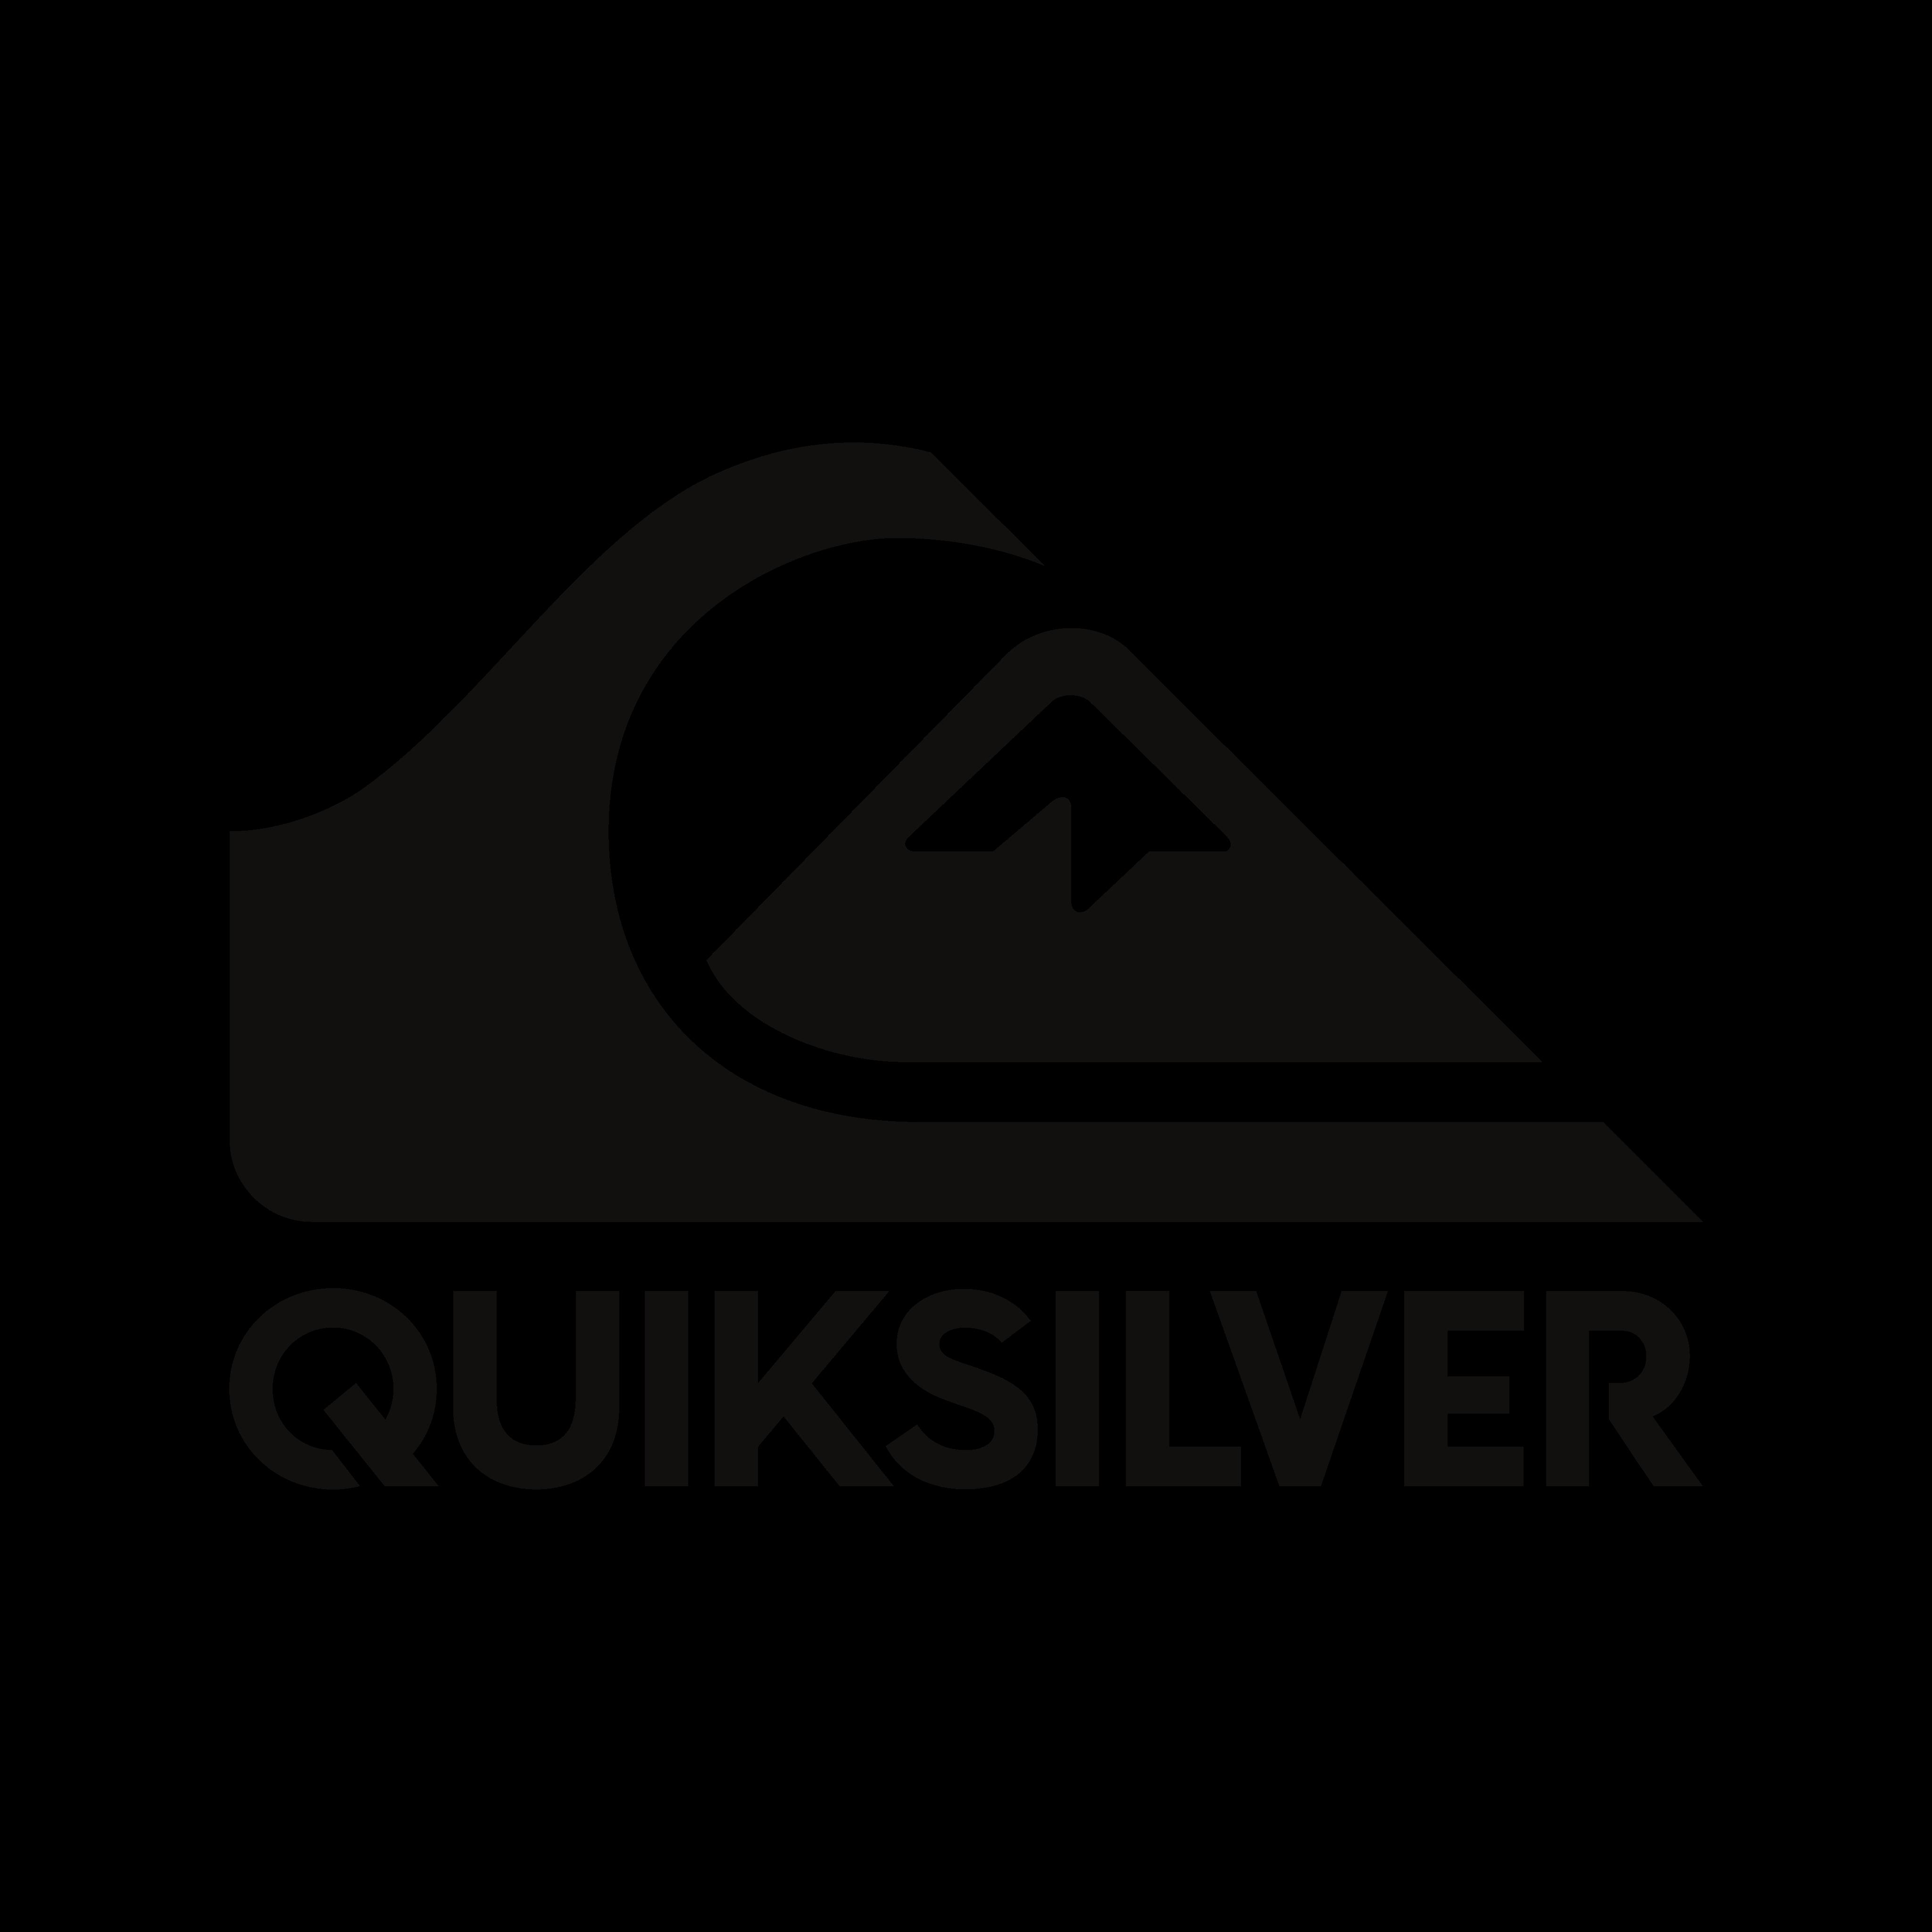 quiksilver logo 0 - Quiksilver Logo